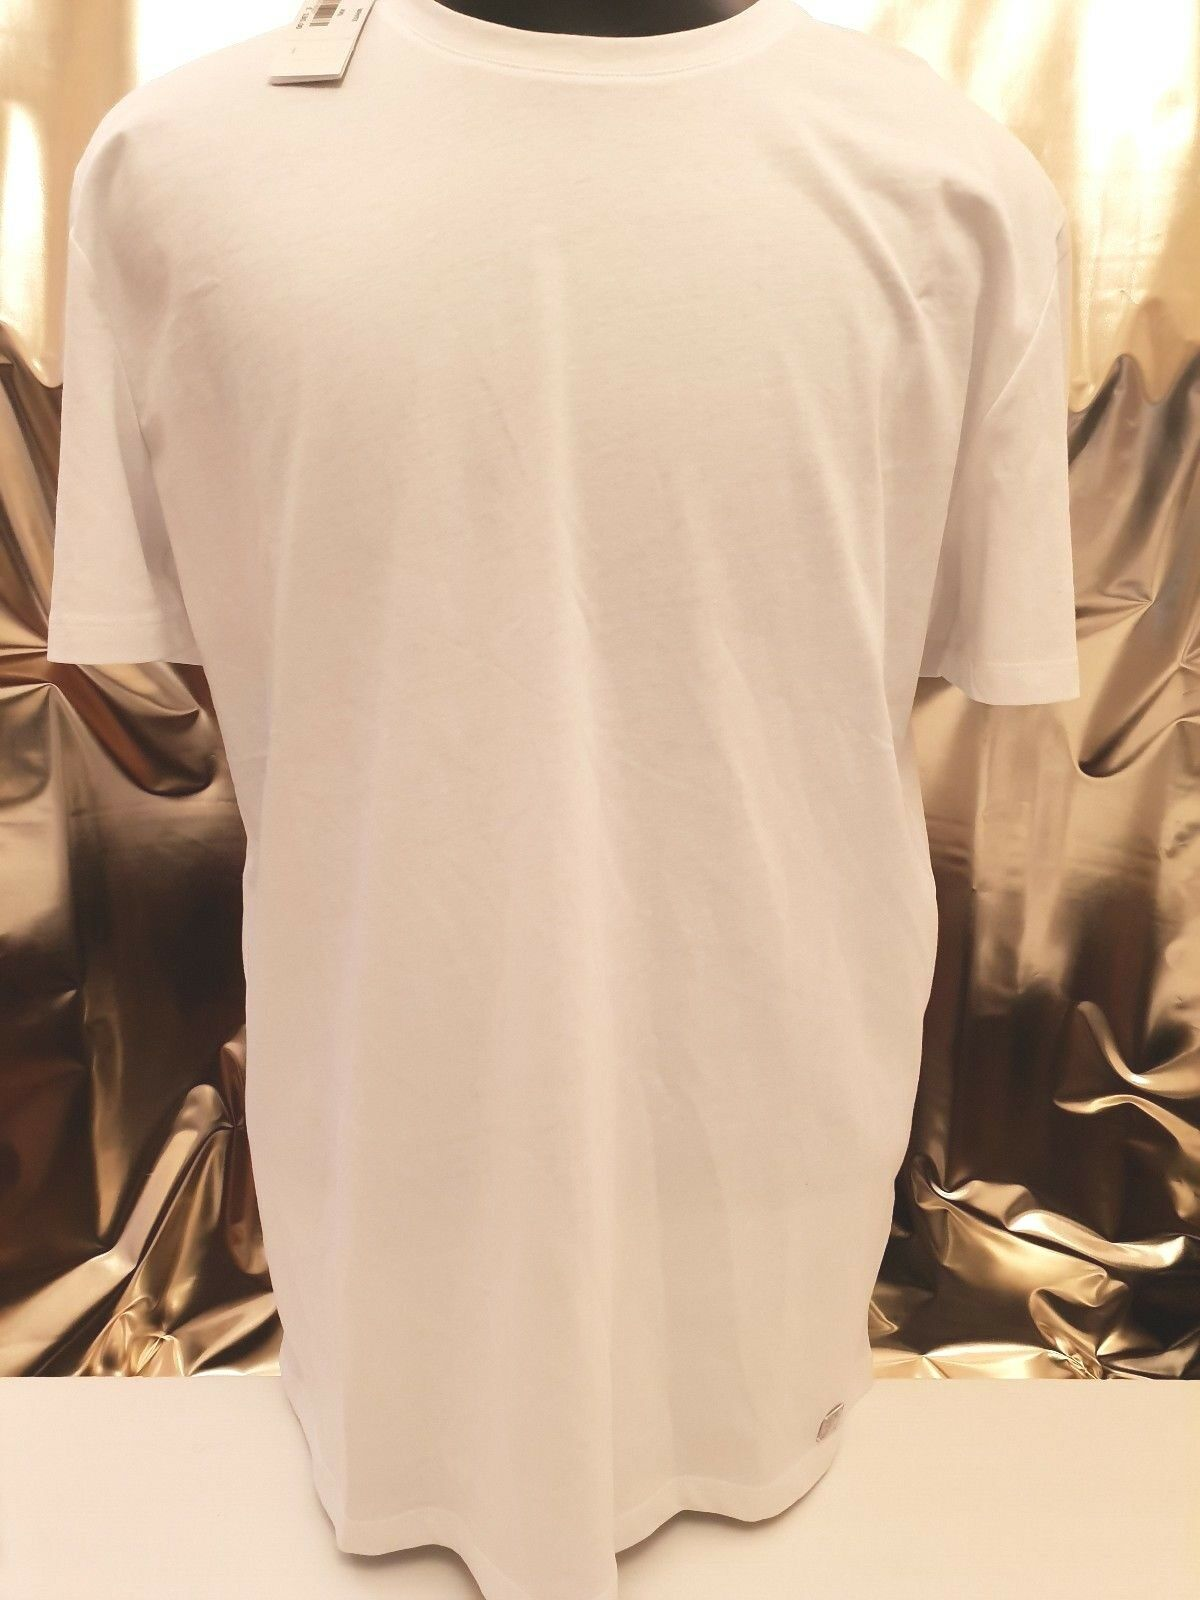 VERSACE COLLECTION HALF MEDUSA t-shirt size XXL in white  V800683 VJ00413